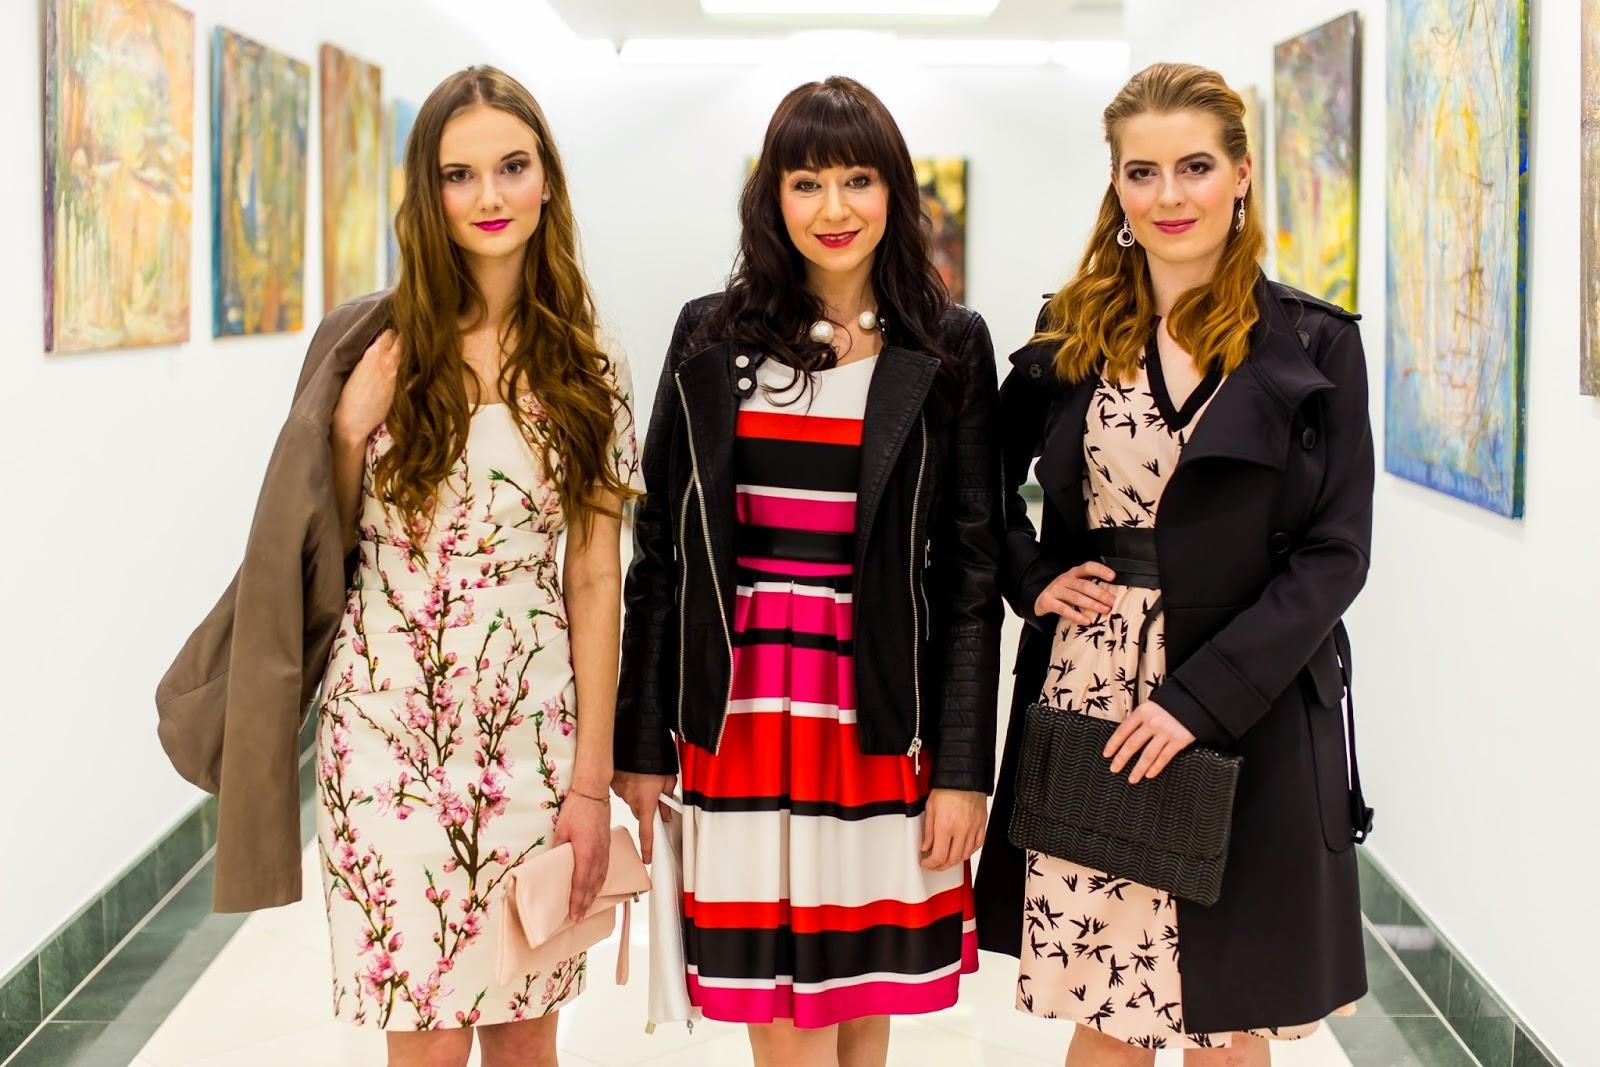 JARNÉ INŠPIRÁCIE Z DIELNE STILAGO_Katharine-fashion is beautiful_Katarína Jakubčová_fashion blogger